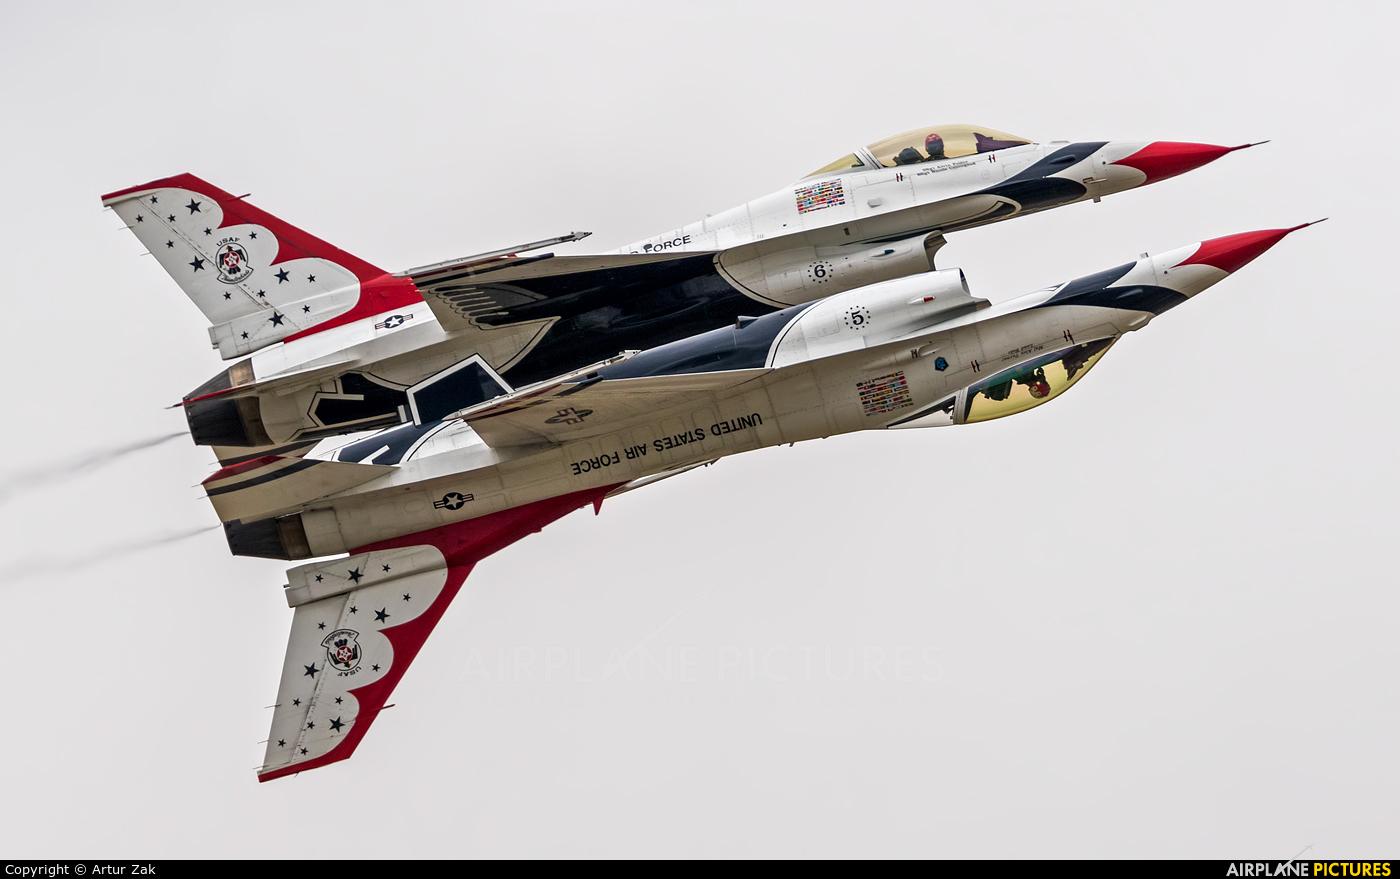 USA - Air Force : Thunderbirds 87-0303 aircraft at Fairford